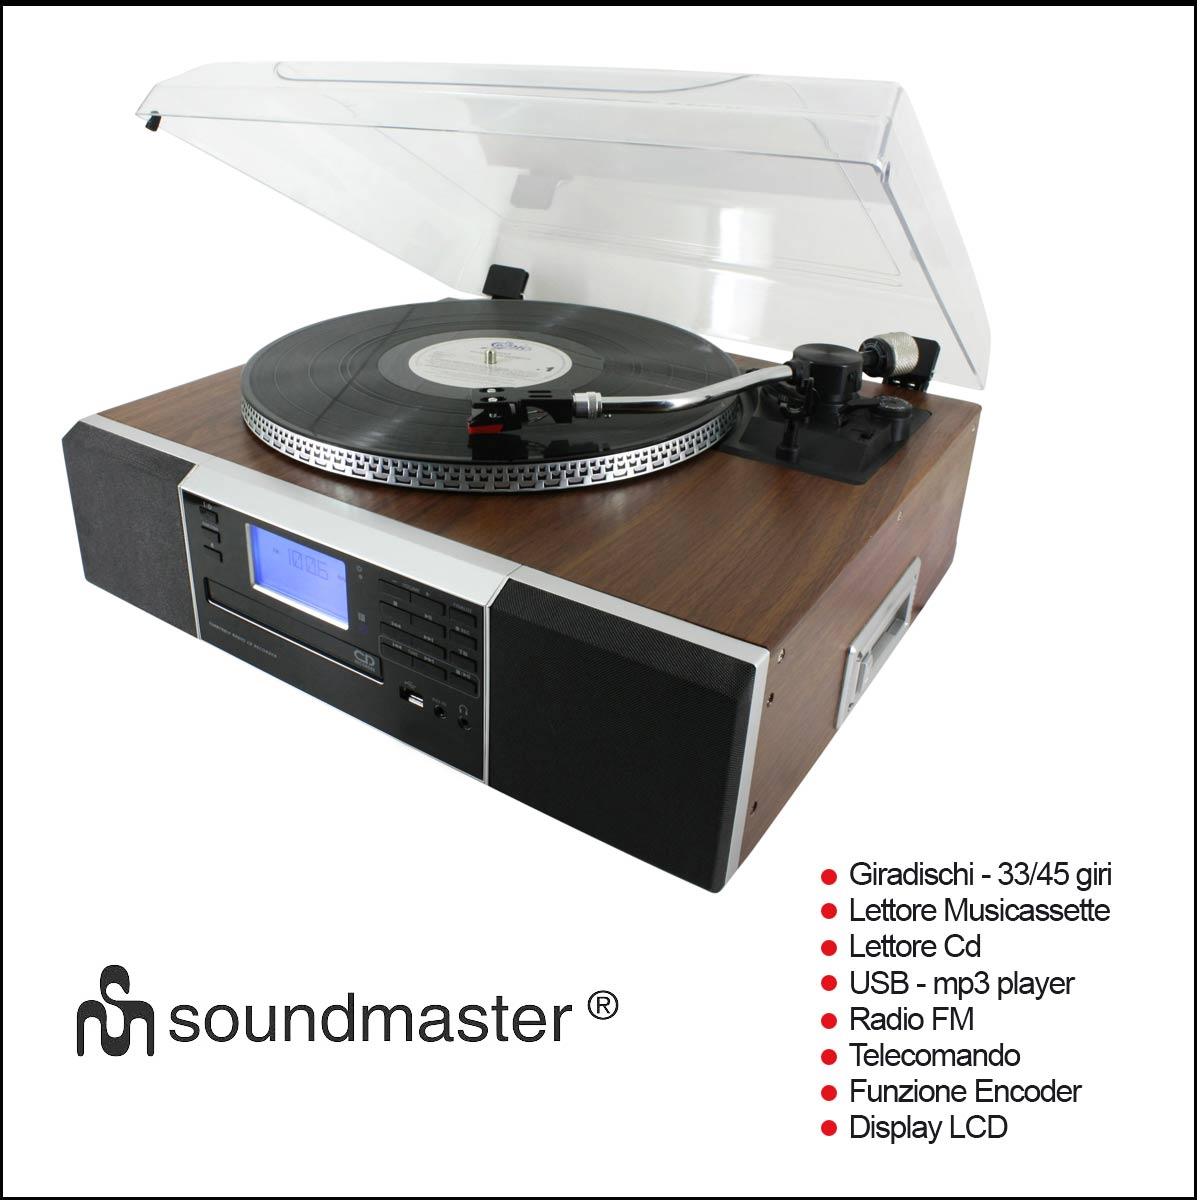 Giradischi Soundmaster pl905 multifunzione